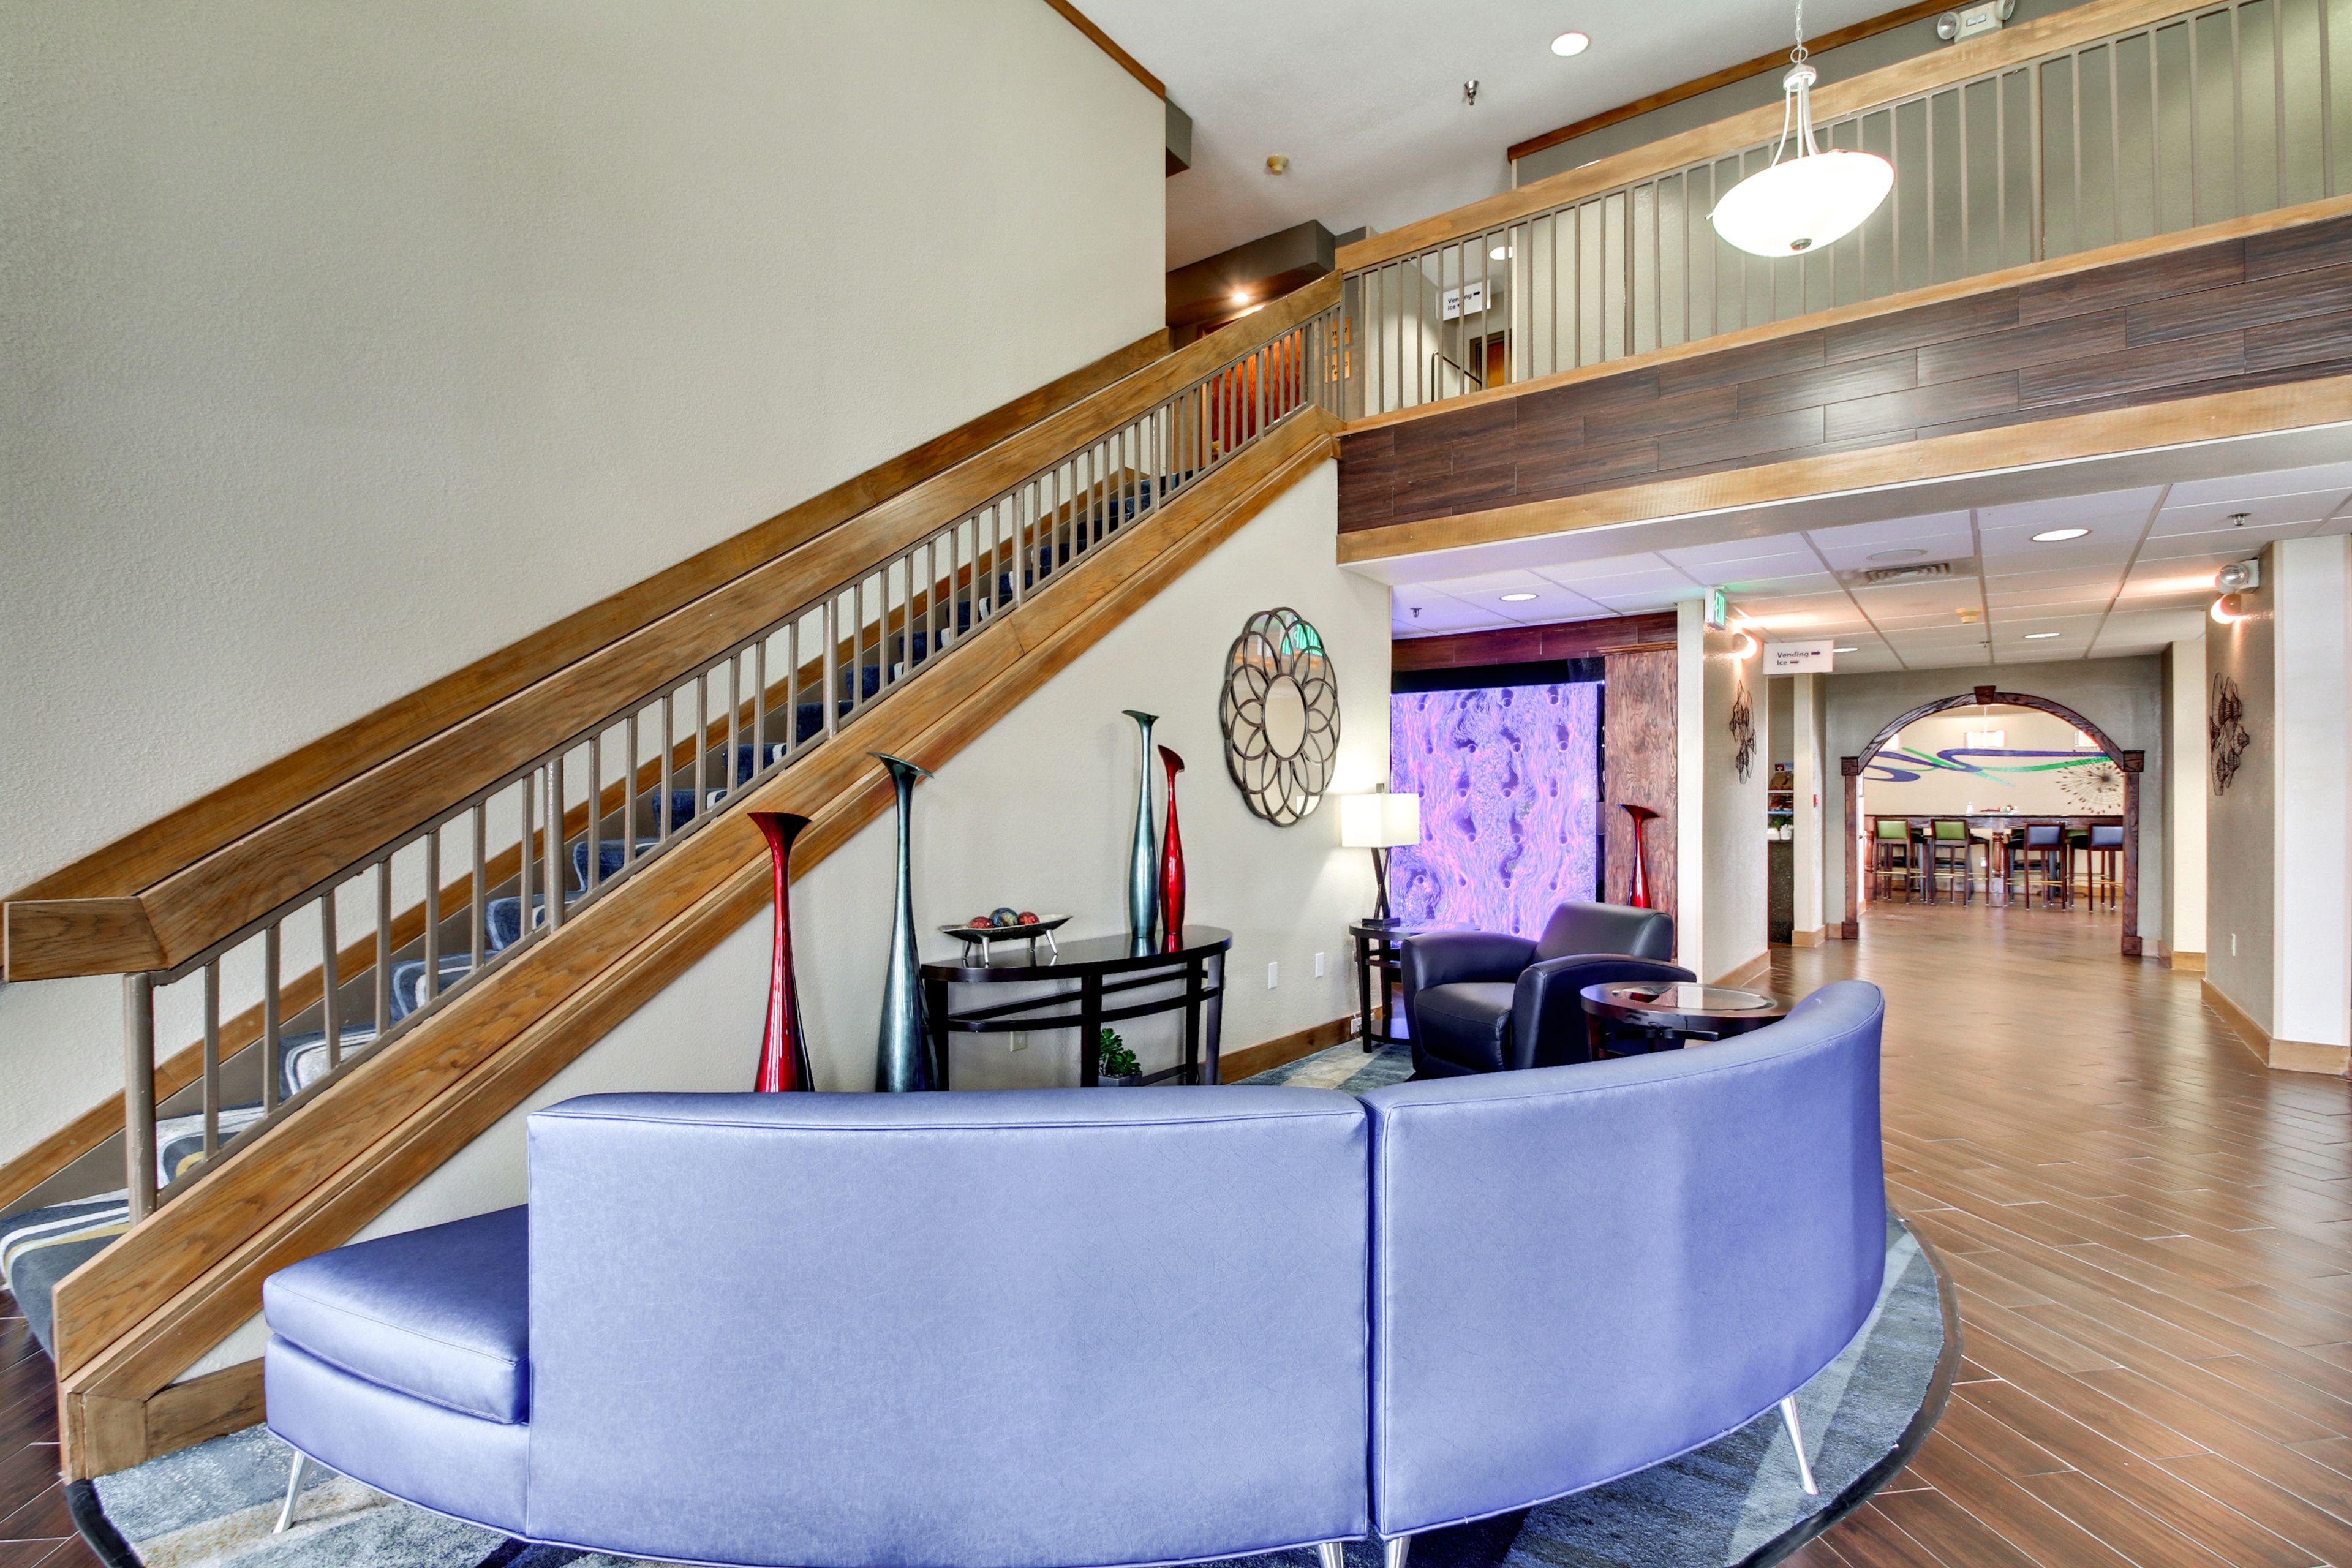 Holiday Inn Express Marshfield (Springfield Area) image 5